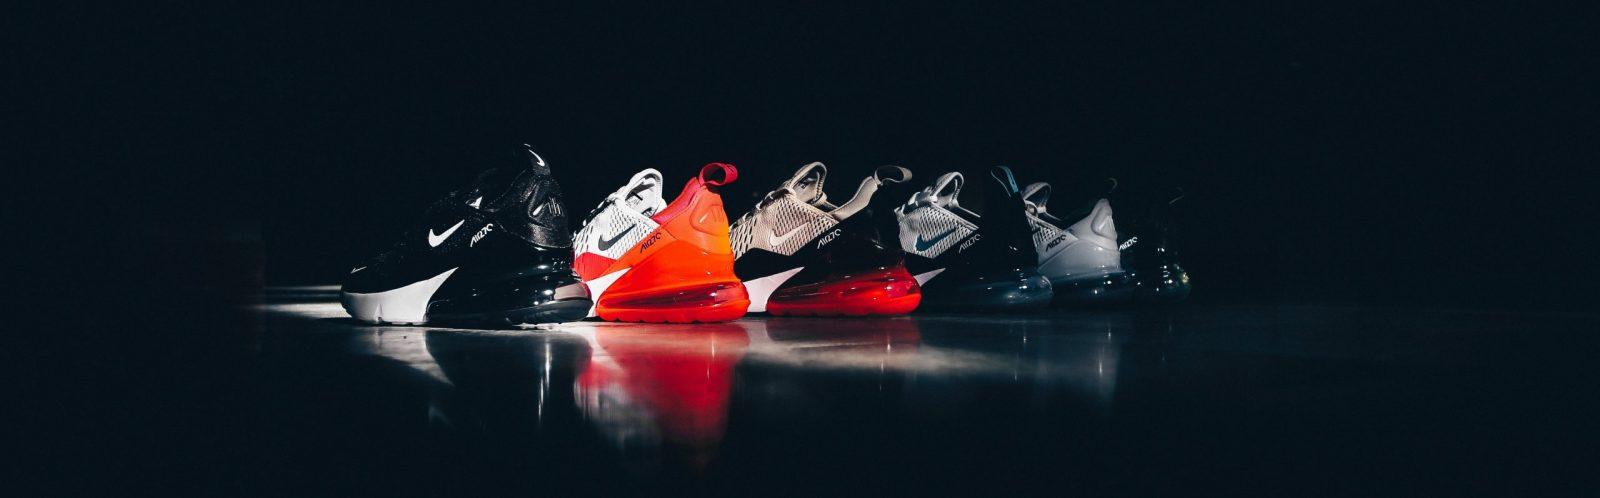 bannière Nike